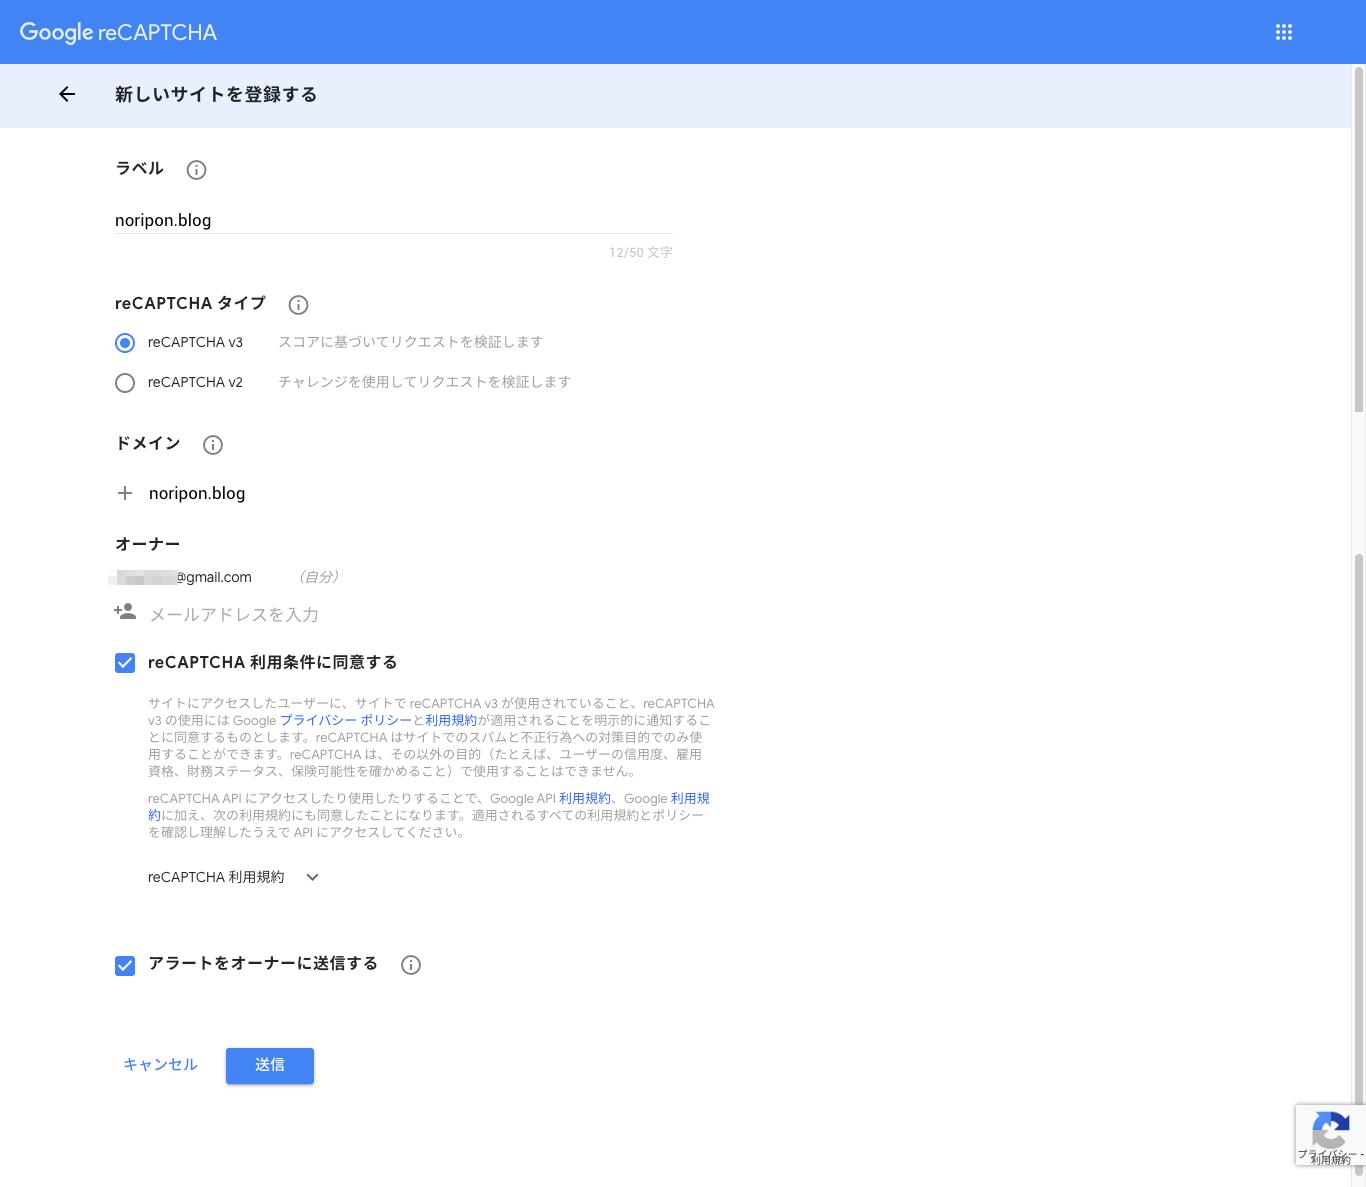 Google reCAPTCHA v3 サイトの設定